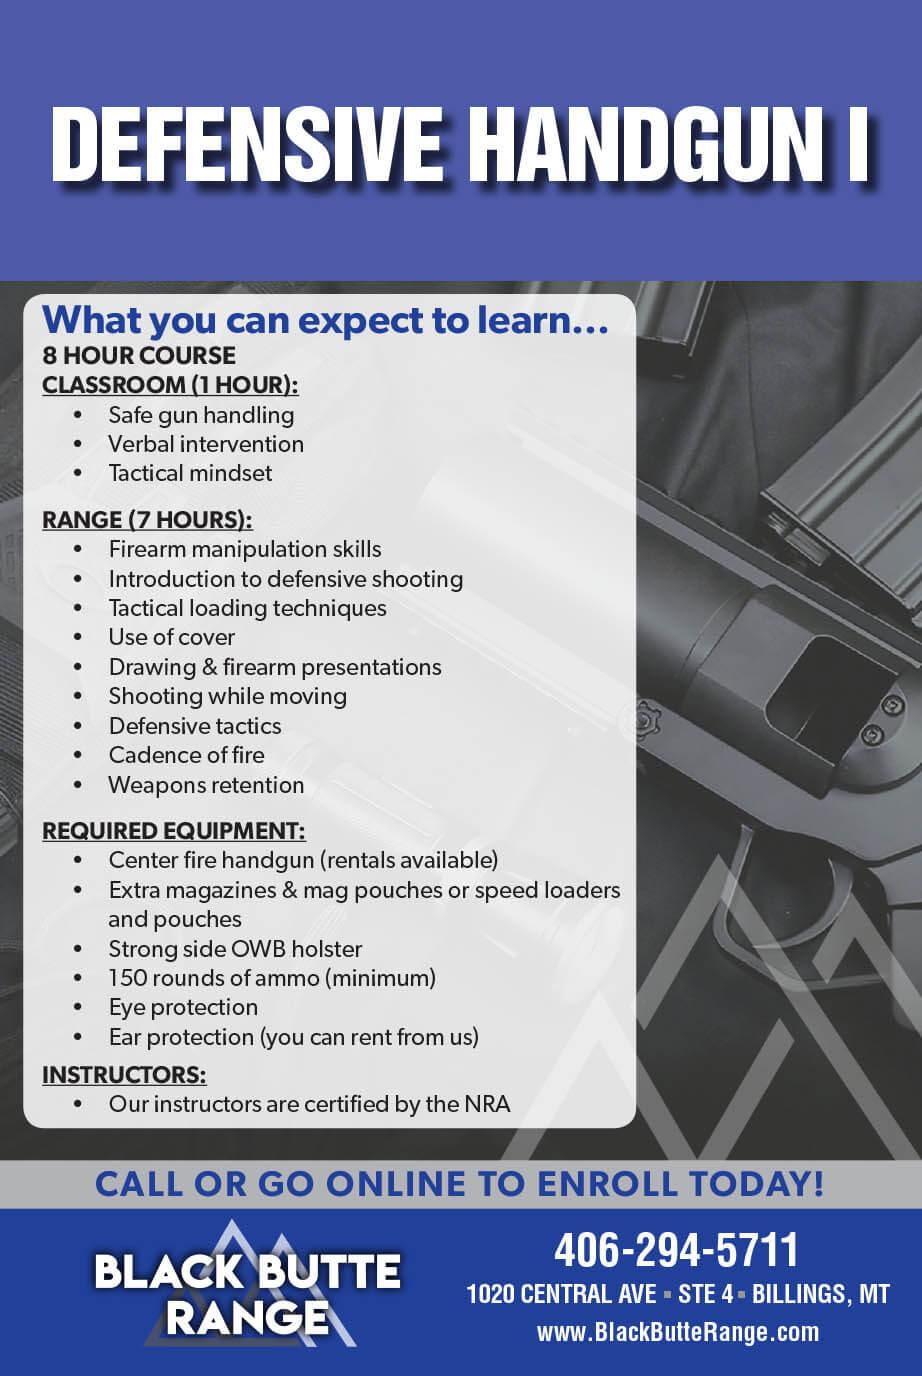 BBR Defensive Handgun - Our Classes